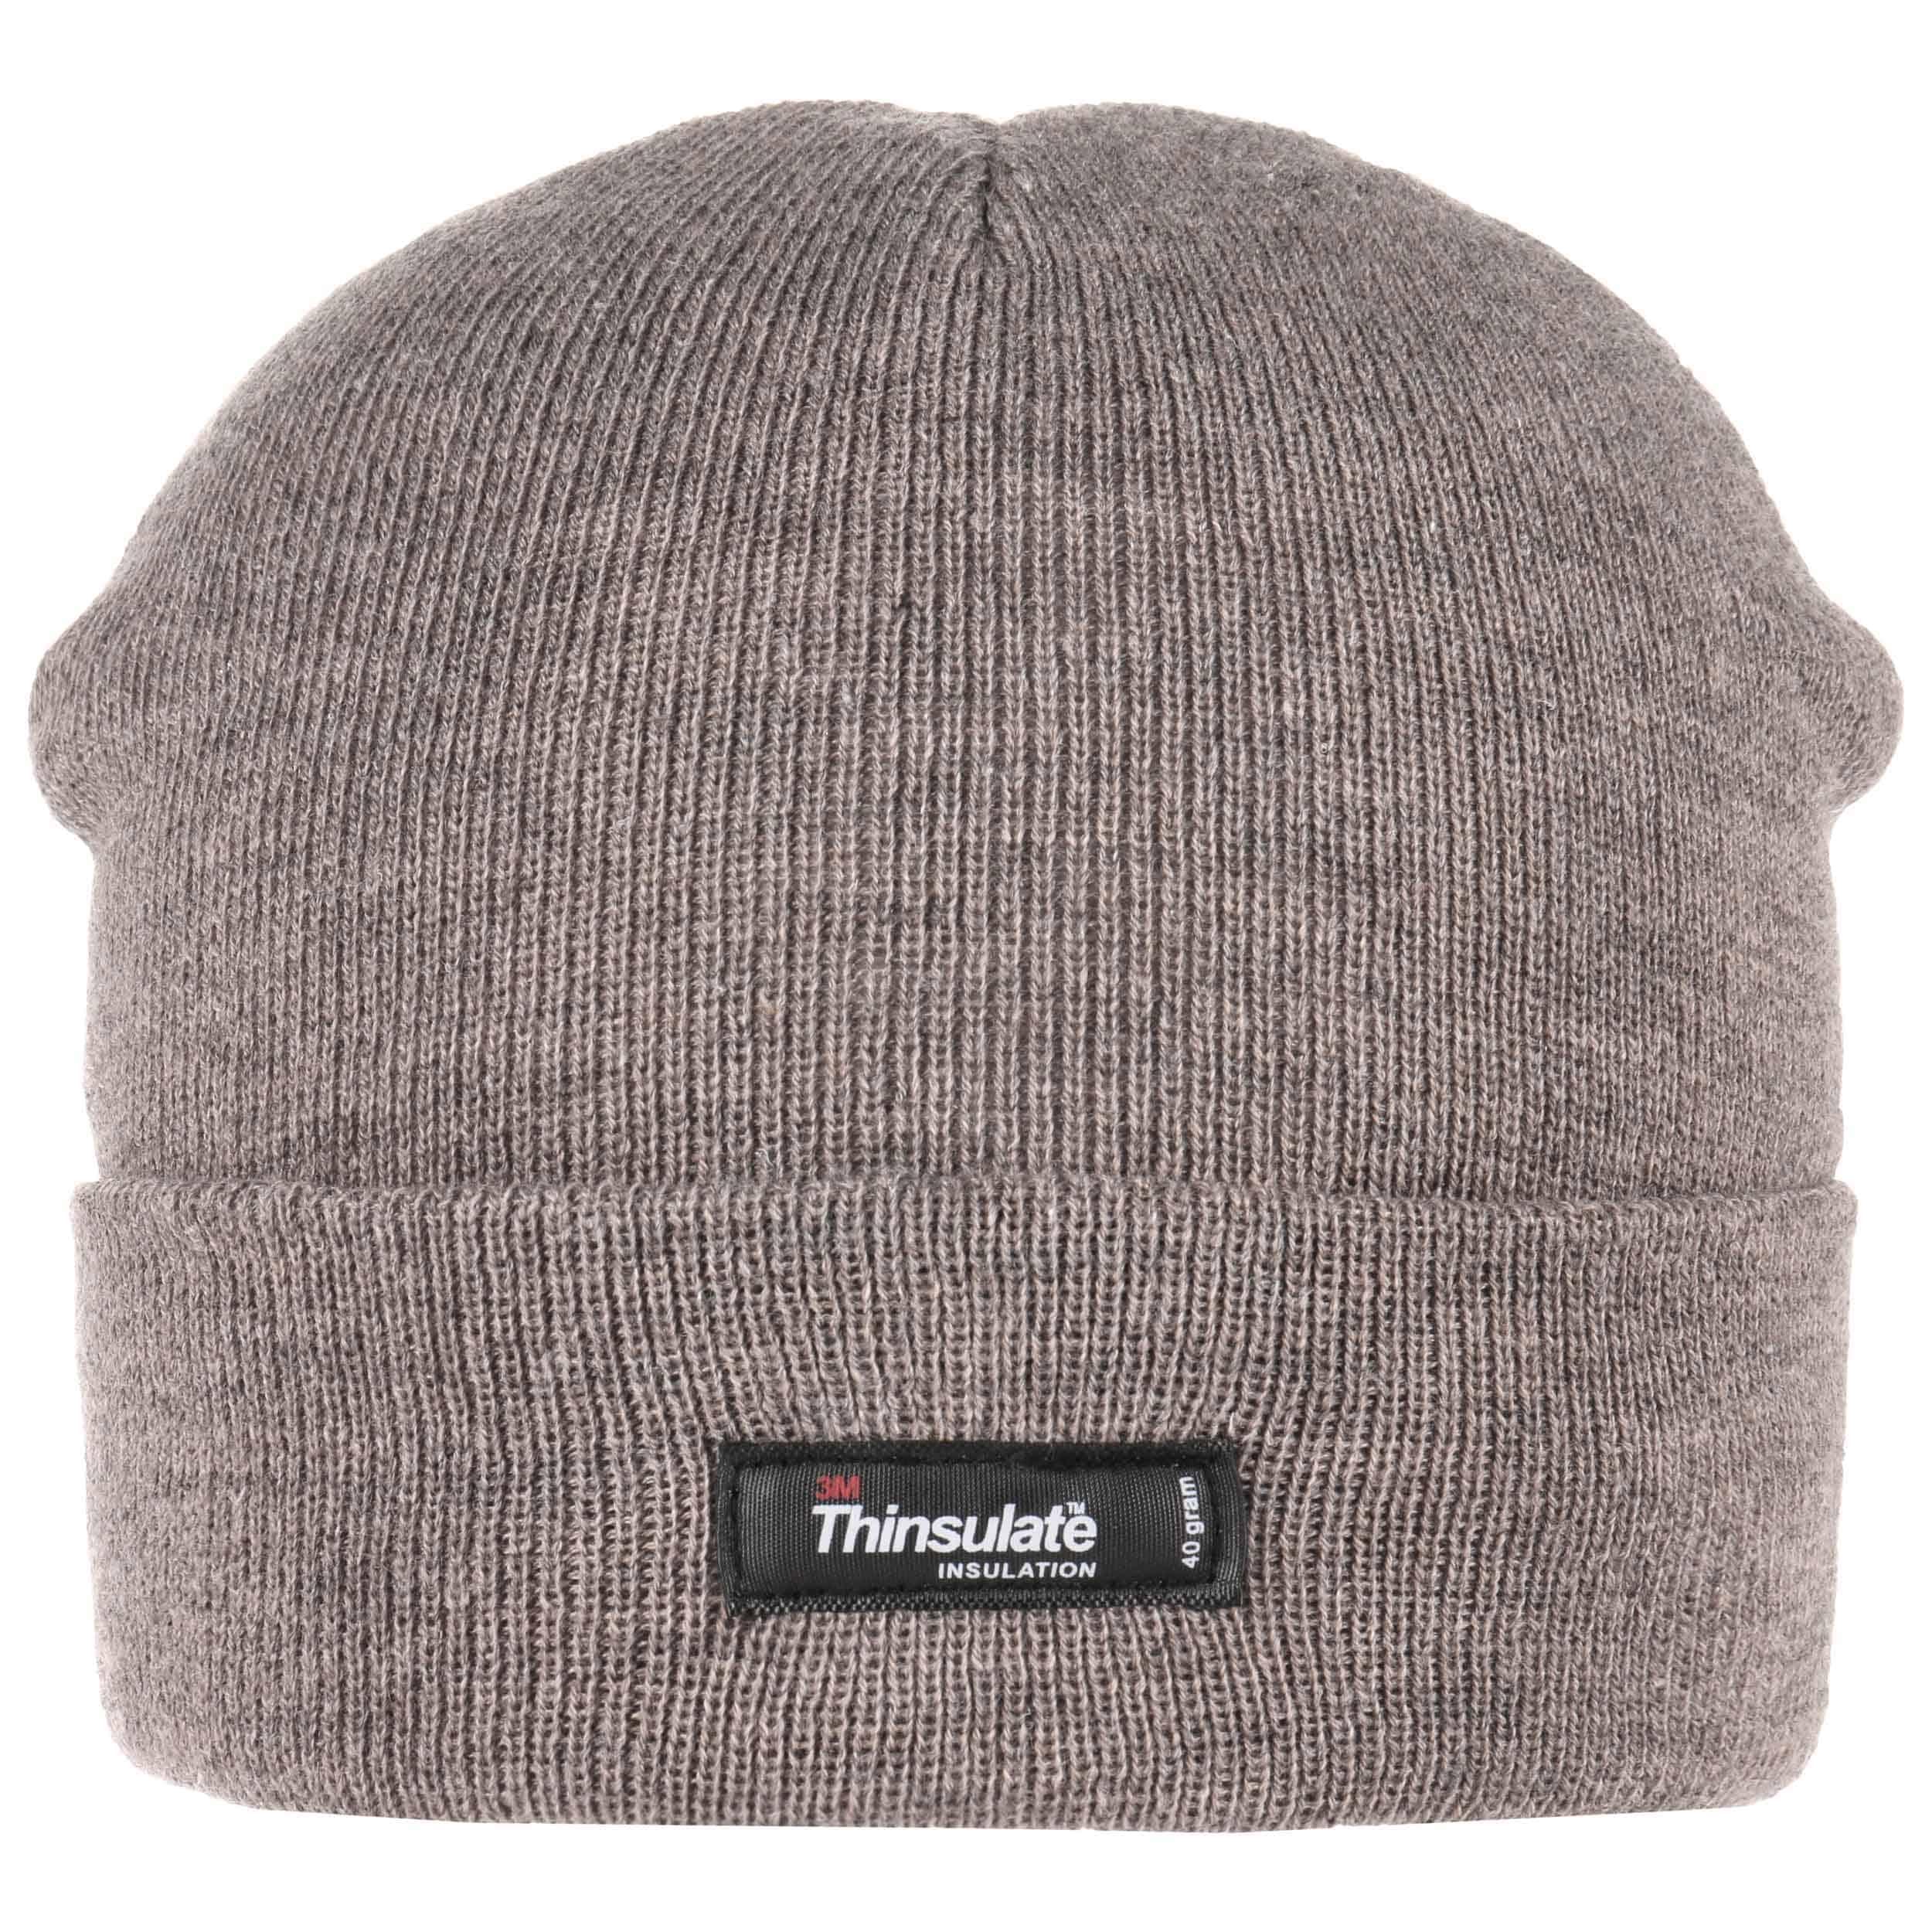 31ae75f64001d ... Thinsulate 3M Beanie Knit Hat with Cuff - beige 3 ...